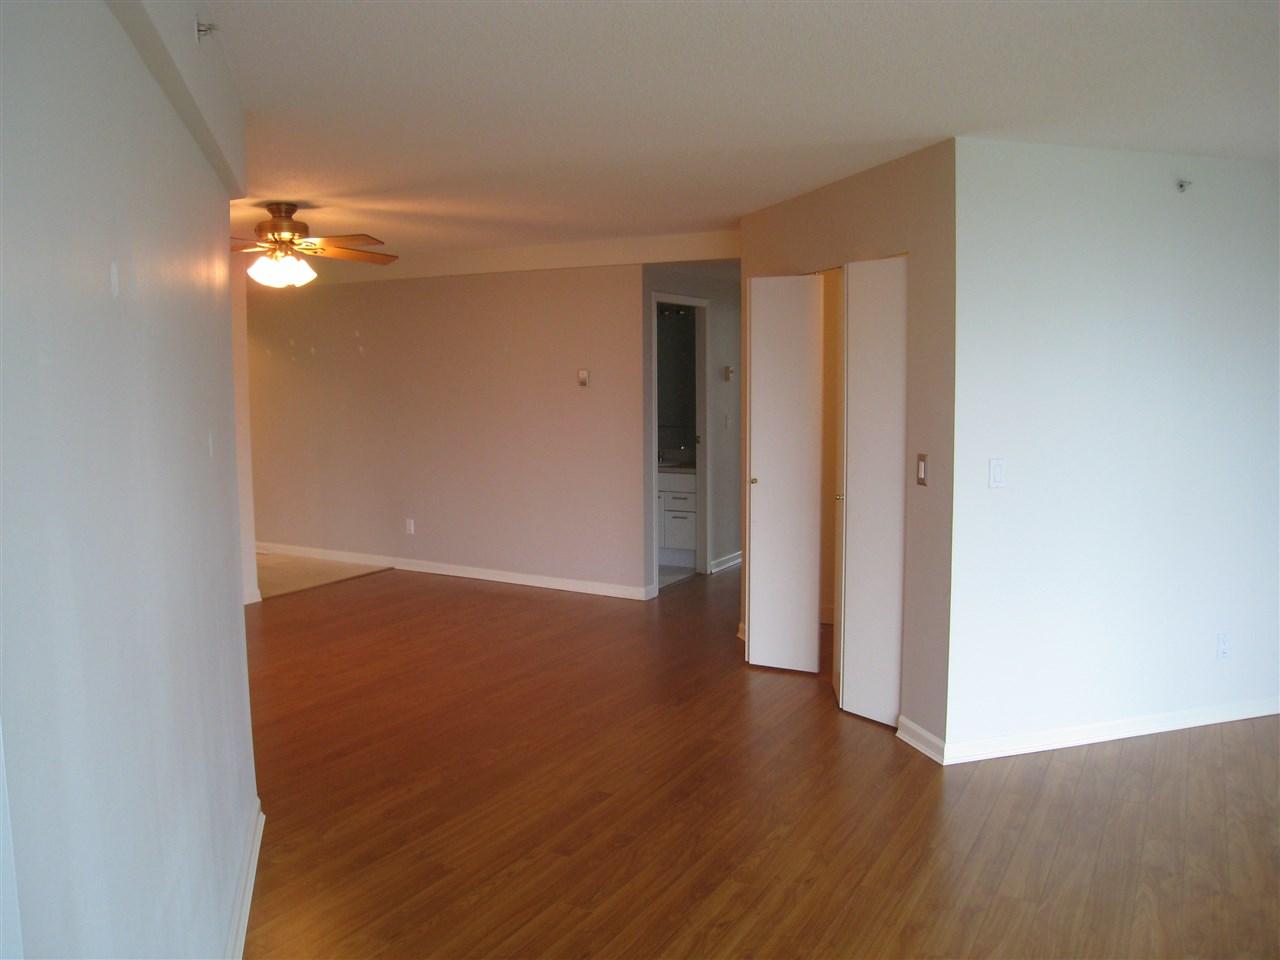 Condo Apartment at 1305 388 DRAKE STREET, Unit 1305, Vancouver West, British Columbia. Image 7